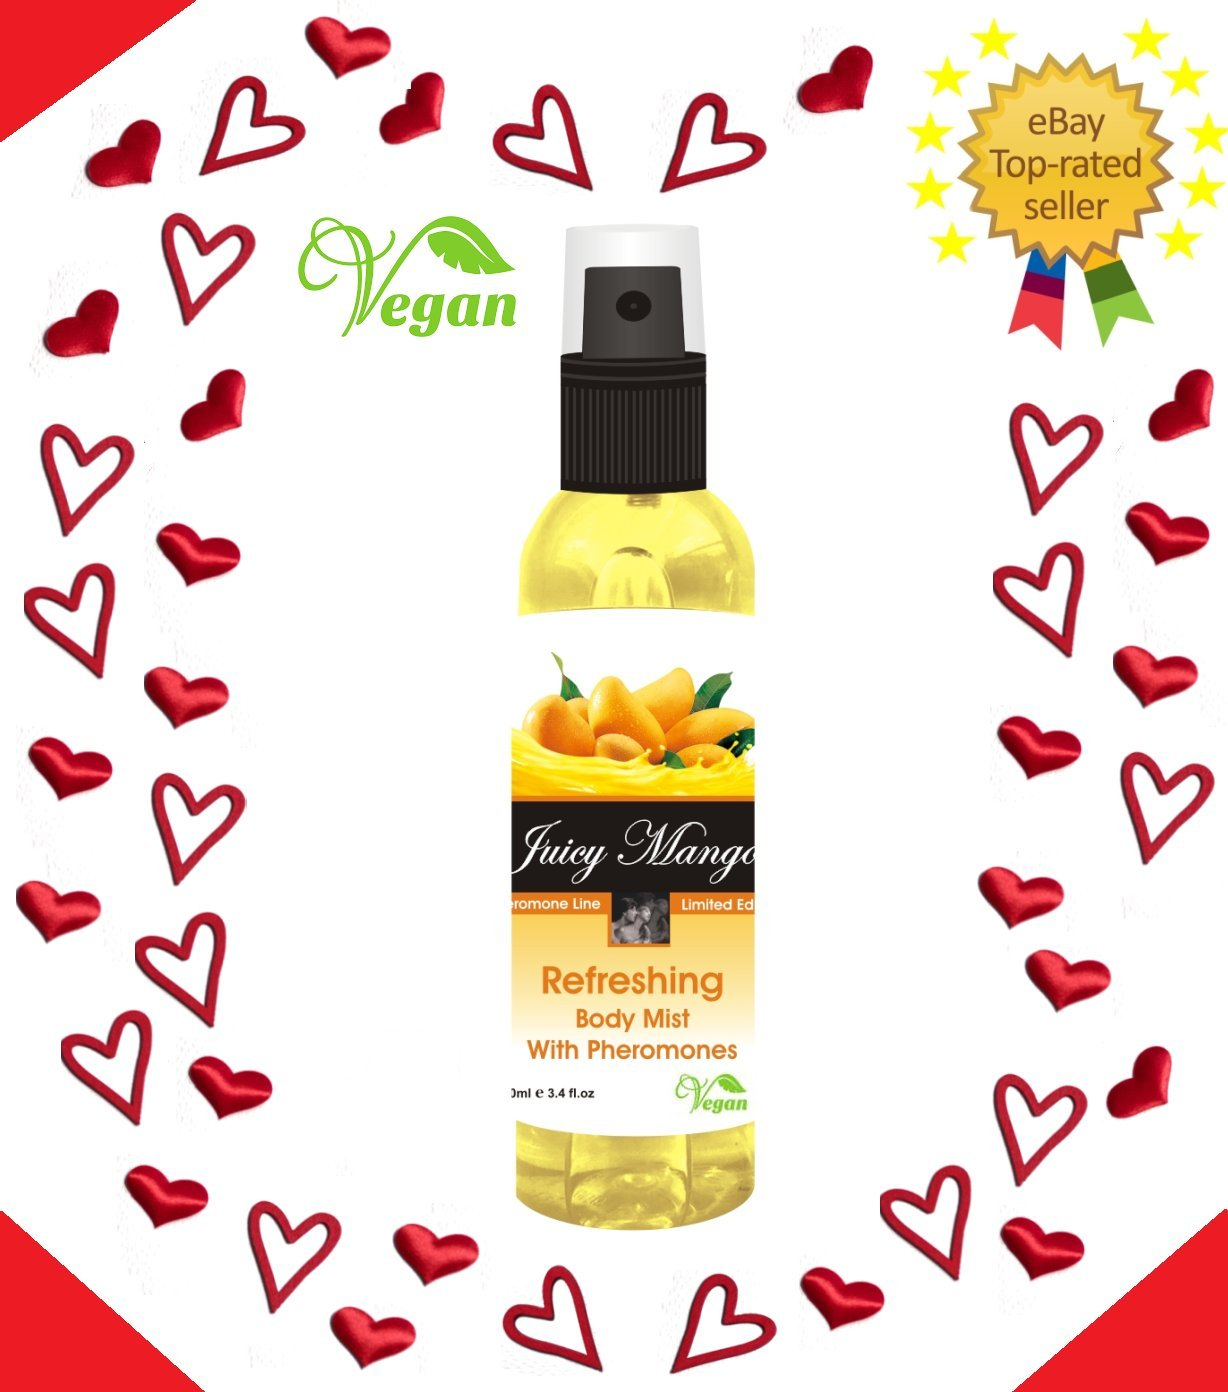 100% Vegan Juicy Mango Refreshing body mist with pheromones 100ml for her sexual attraction Pherolec Global Ltd